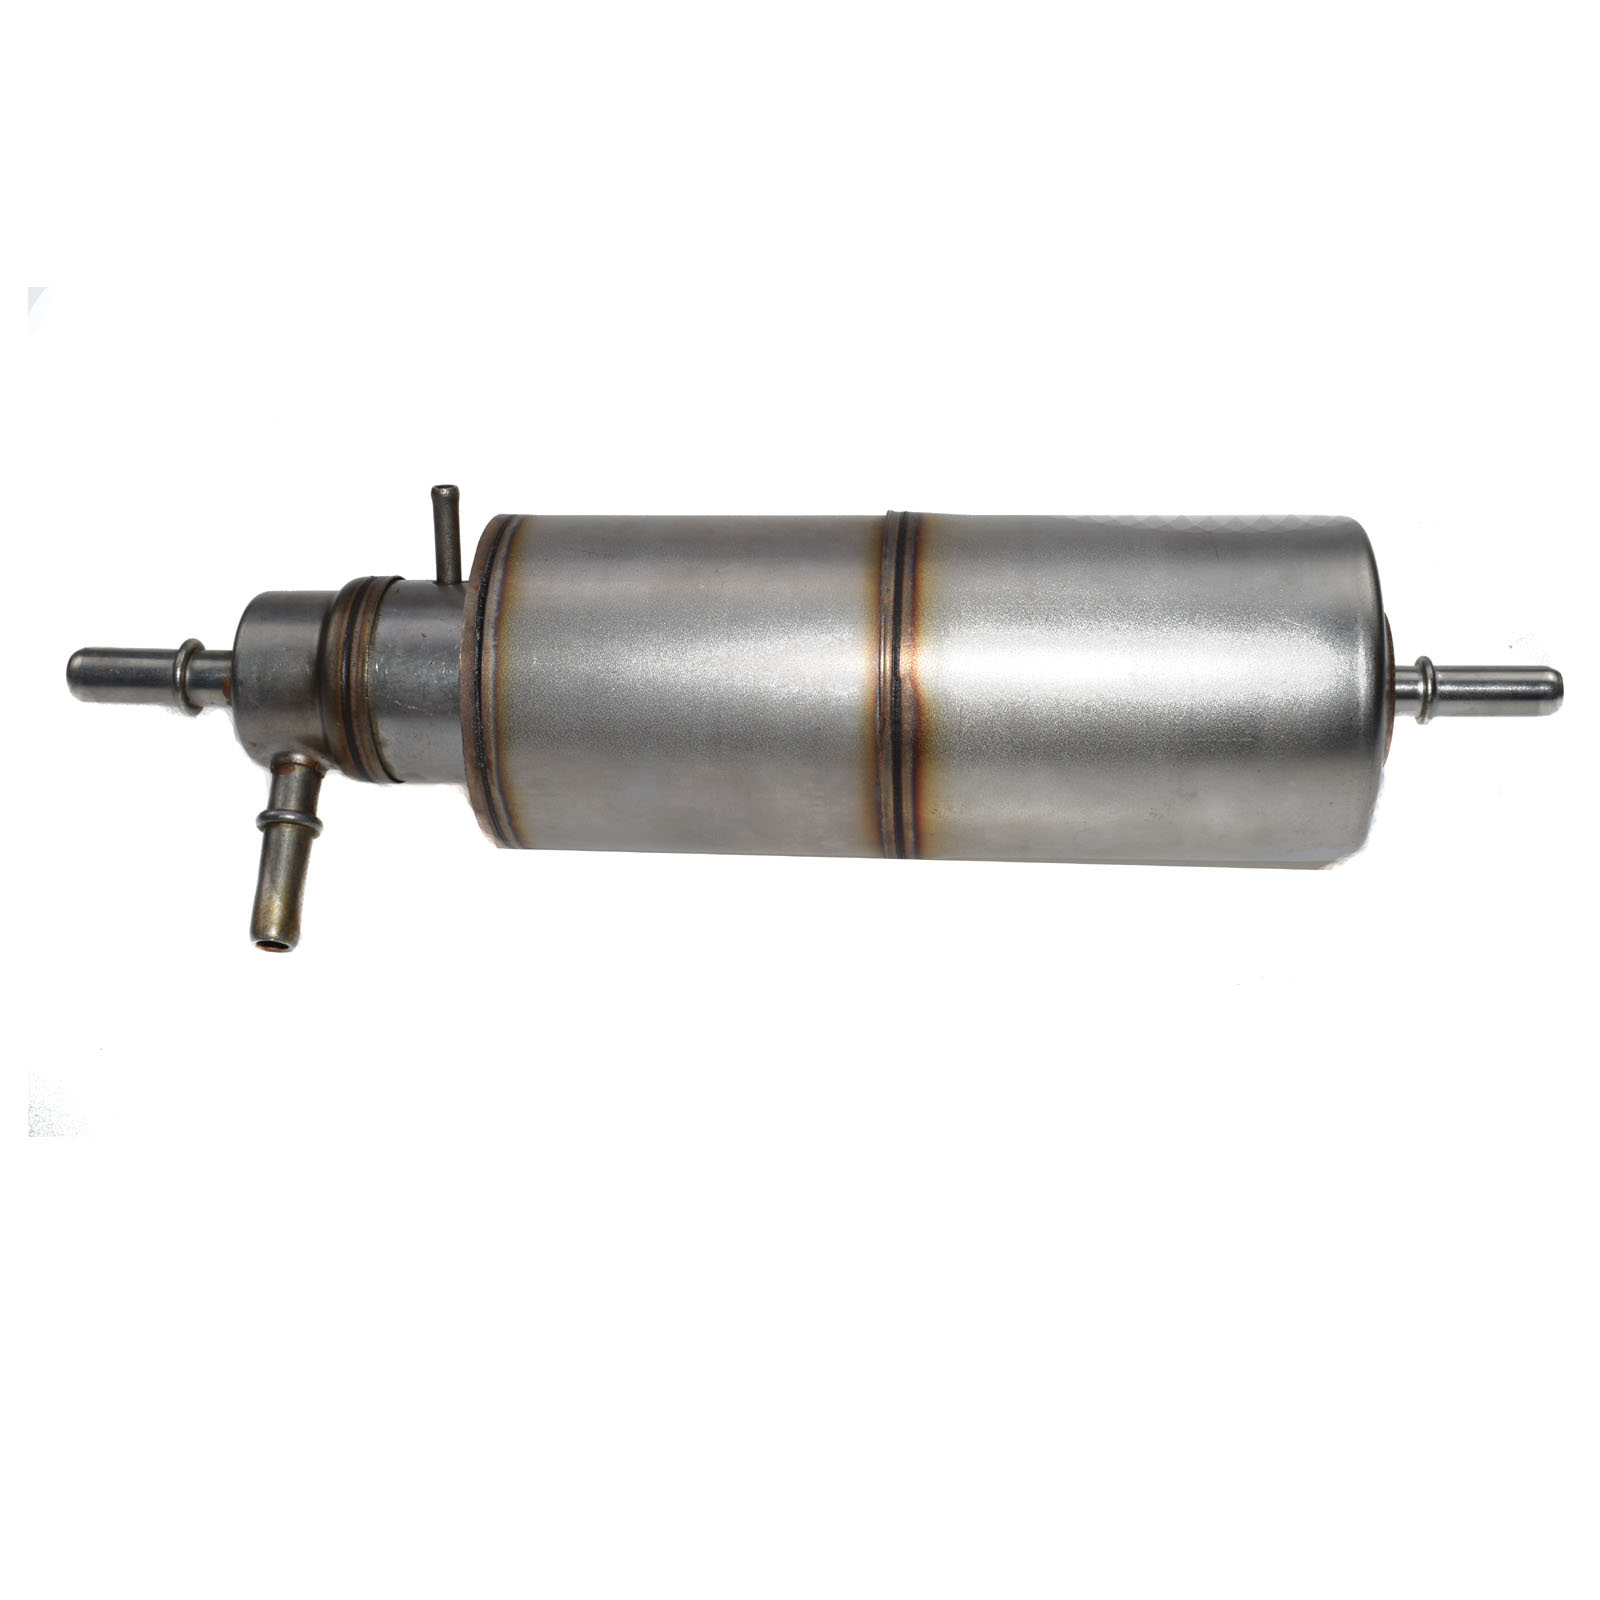 Fit Mercedes Benz Ml320 430 350 Kl437 Fuel Filter Pressure Regulator 2008 Location 1634770201